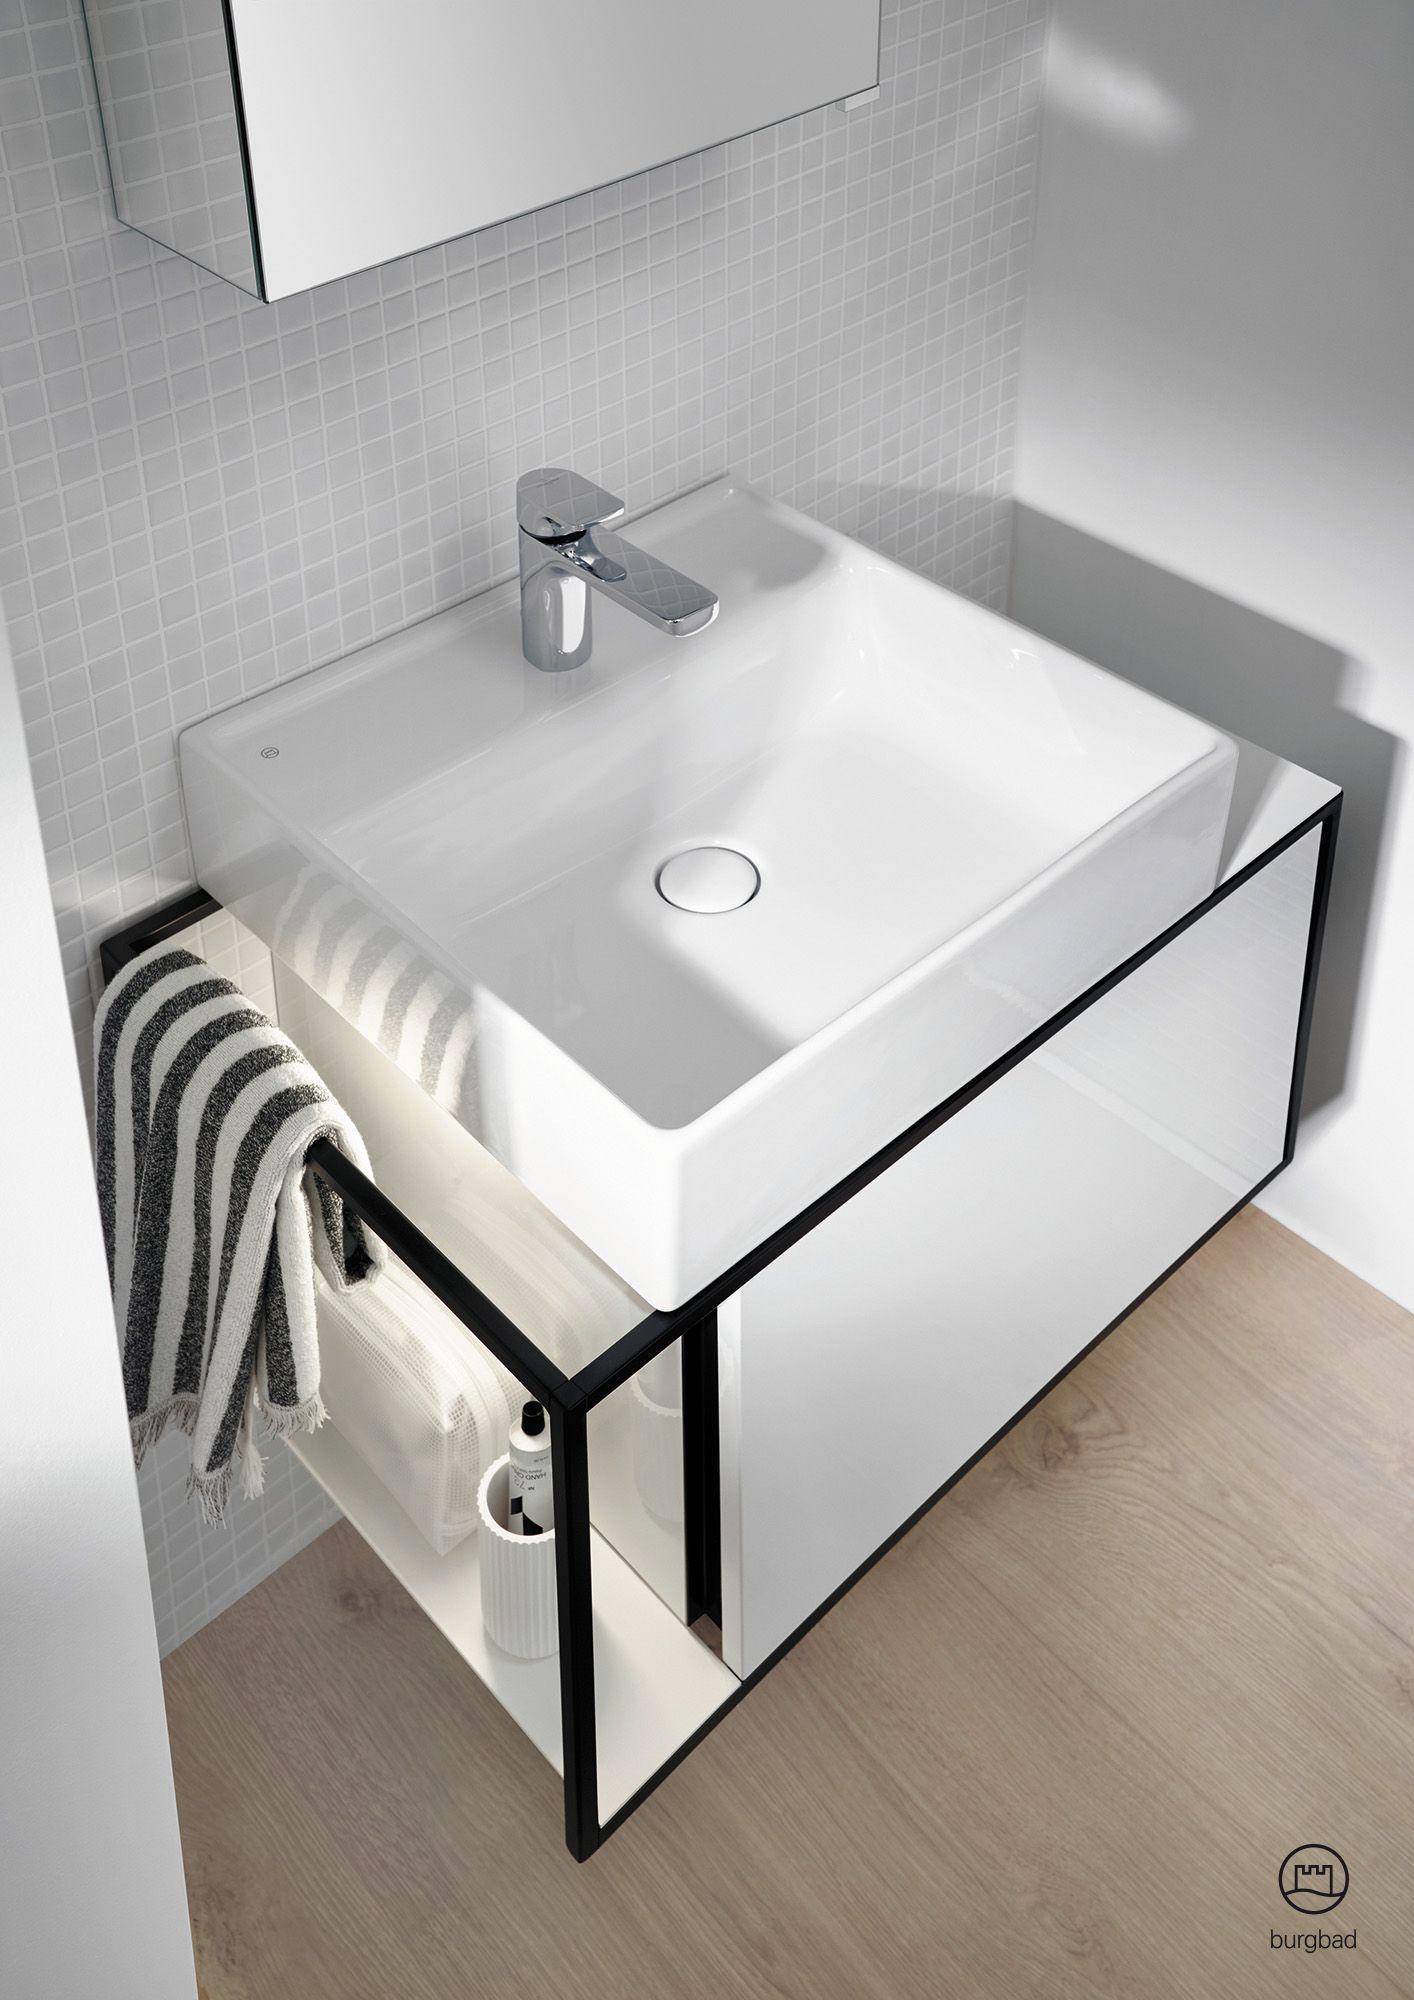 burgbad Junit   Ceramic washbasin with lighting of vanity unit   Badezimmer möbel, Waschtisch ...